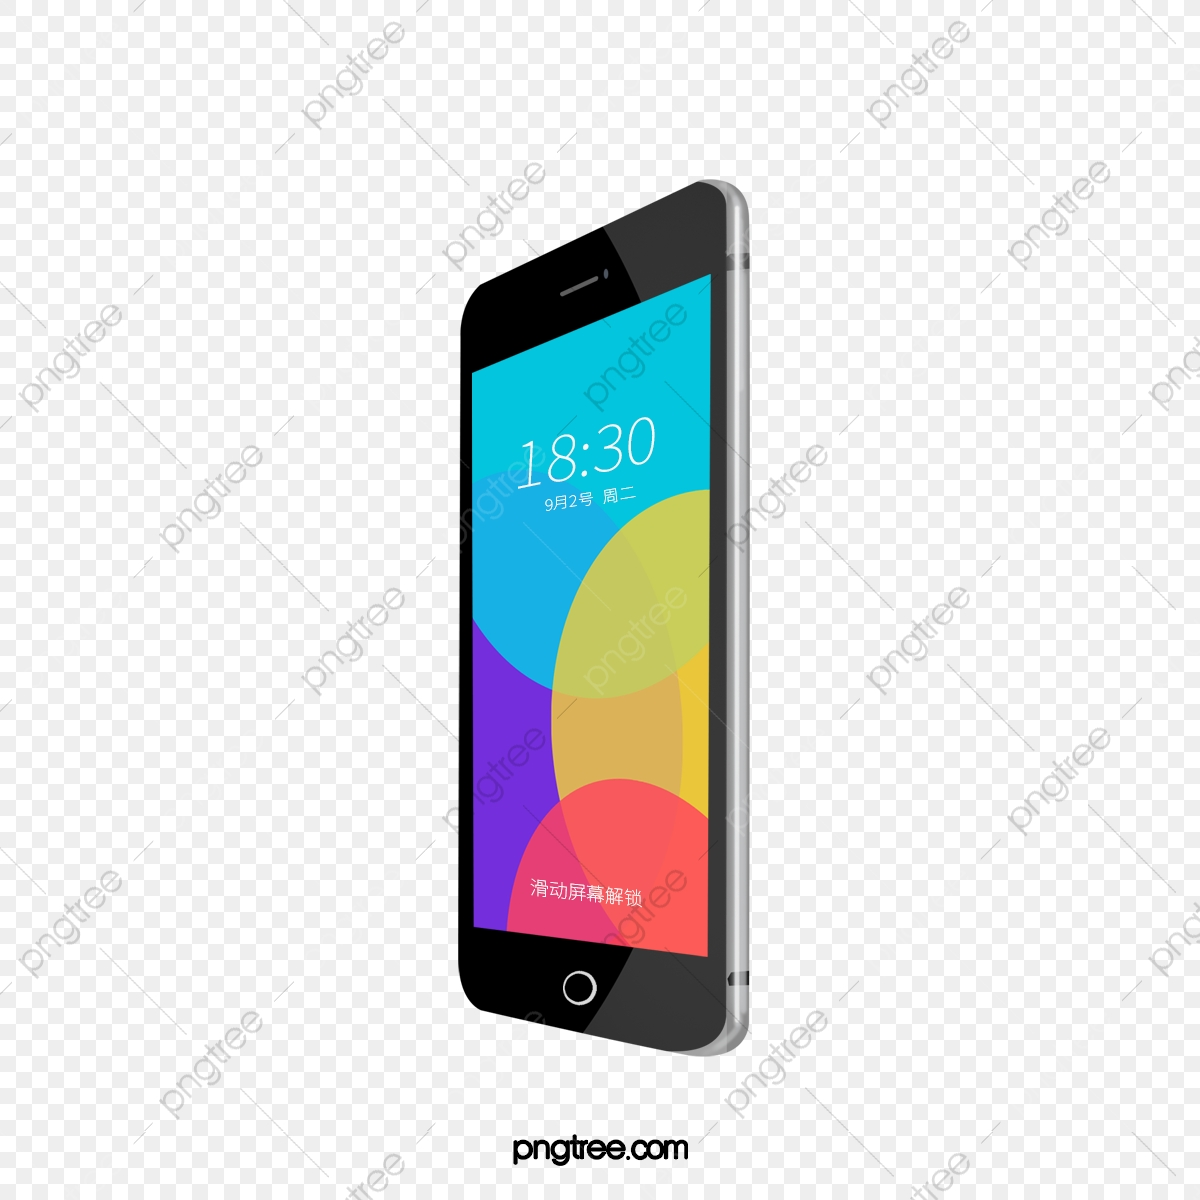 descargar juegos gratis para celulares tactil android